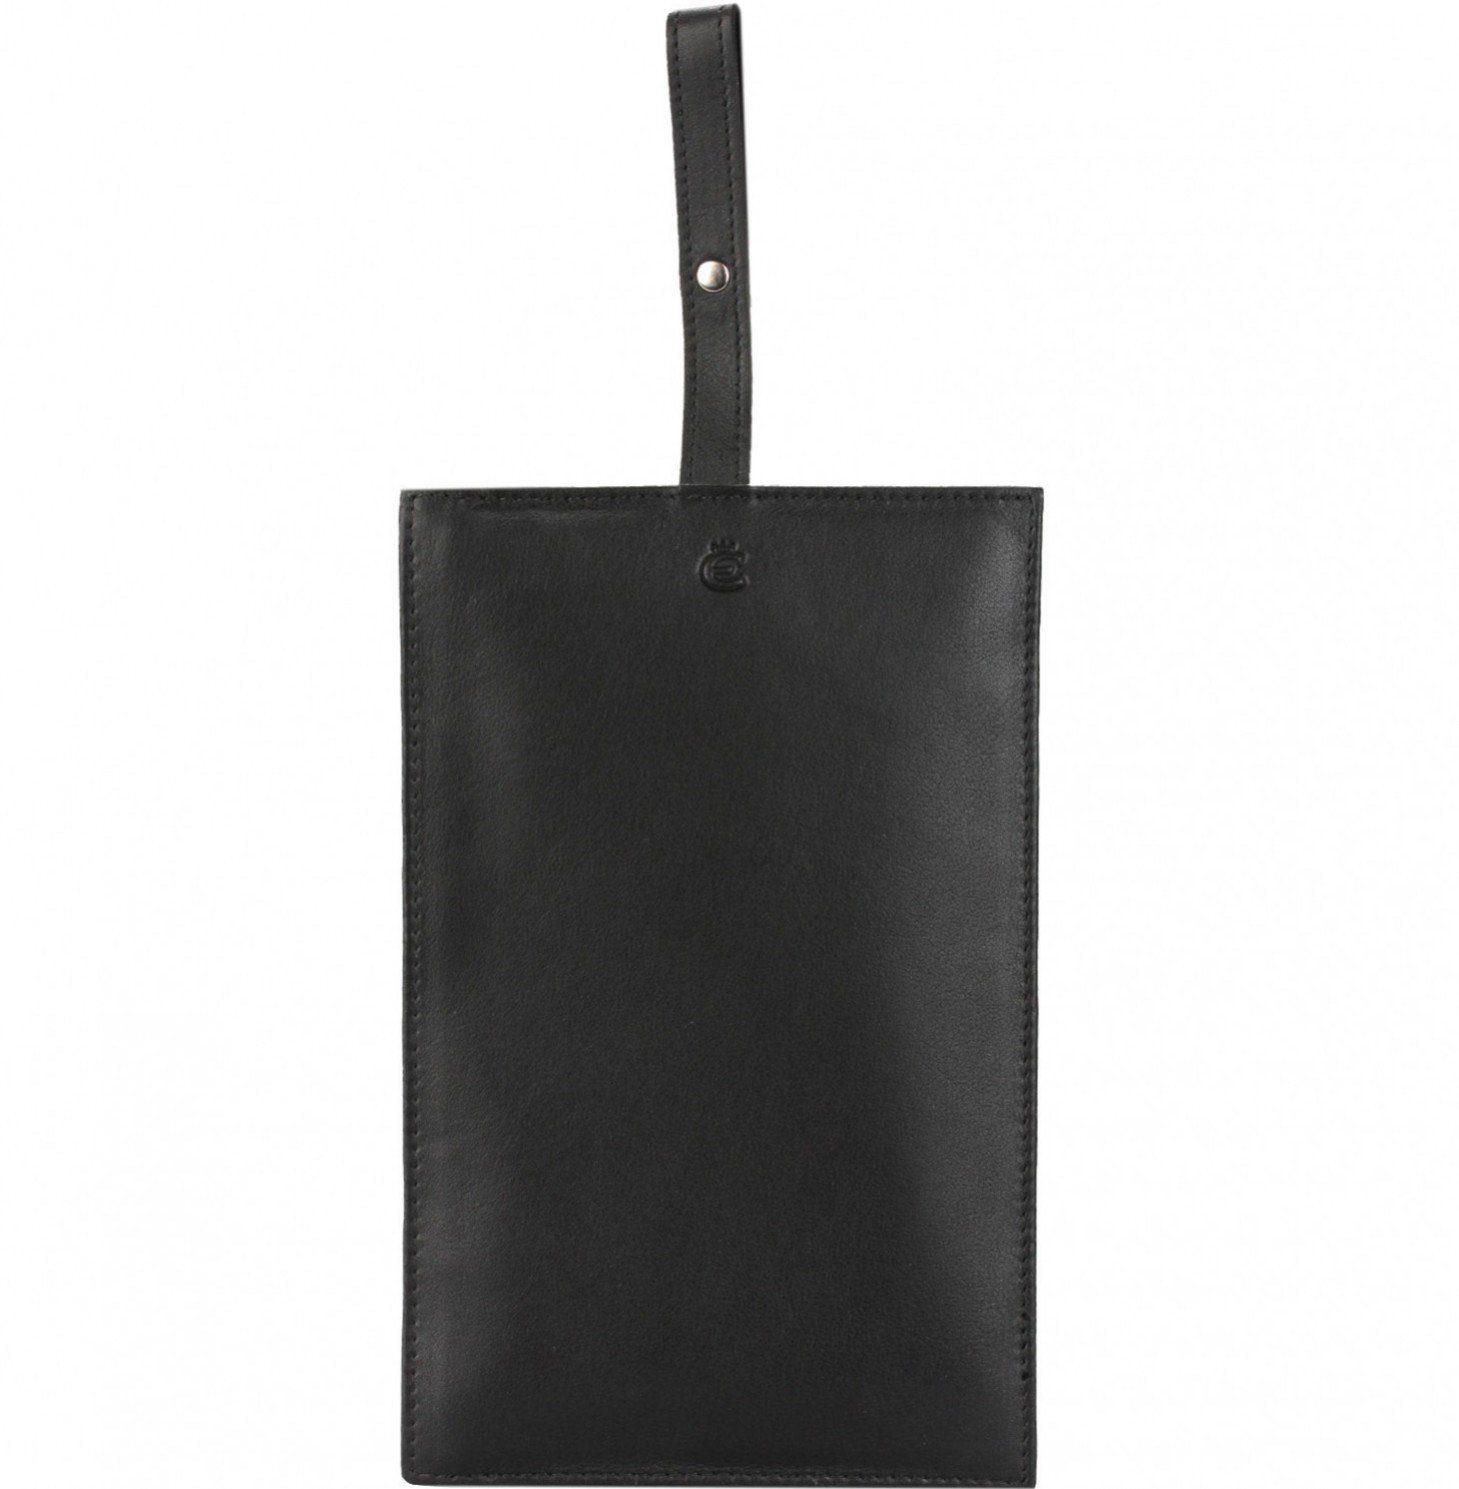 Esquire Eco Geldbörse Leder 18,5 cm